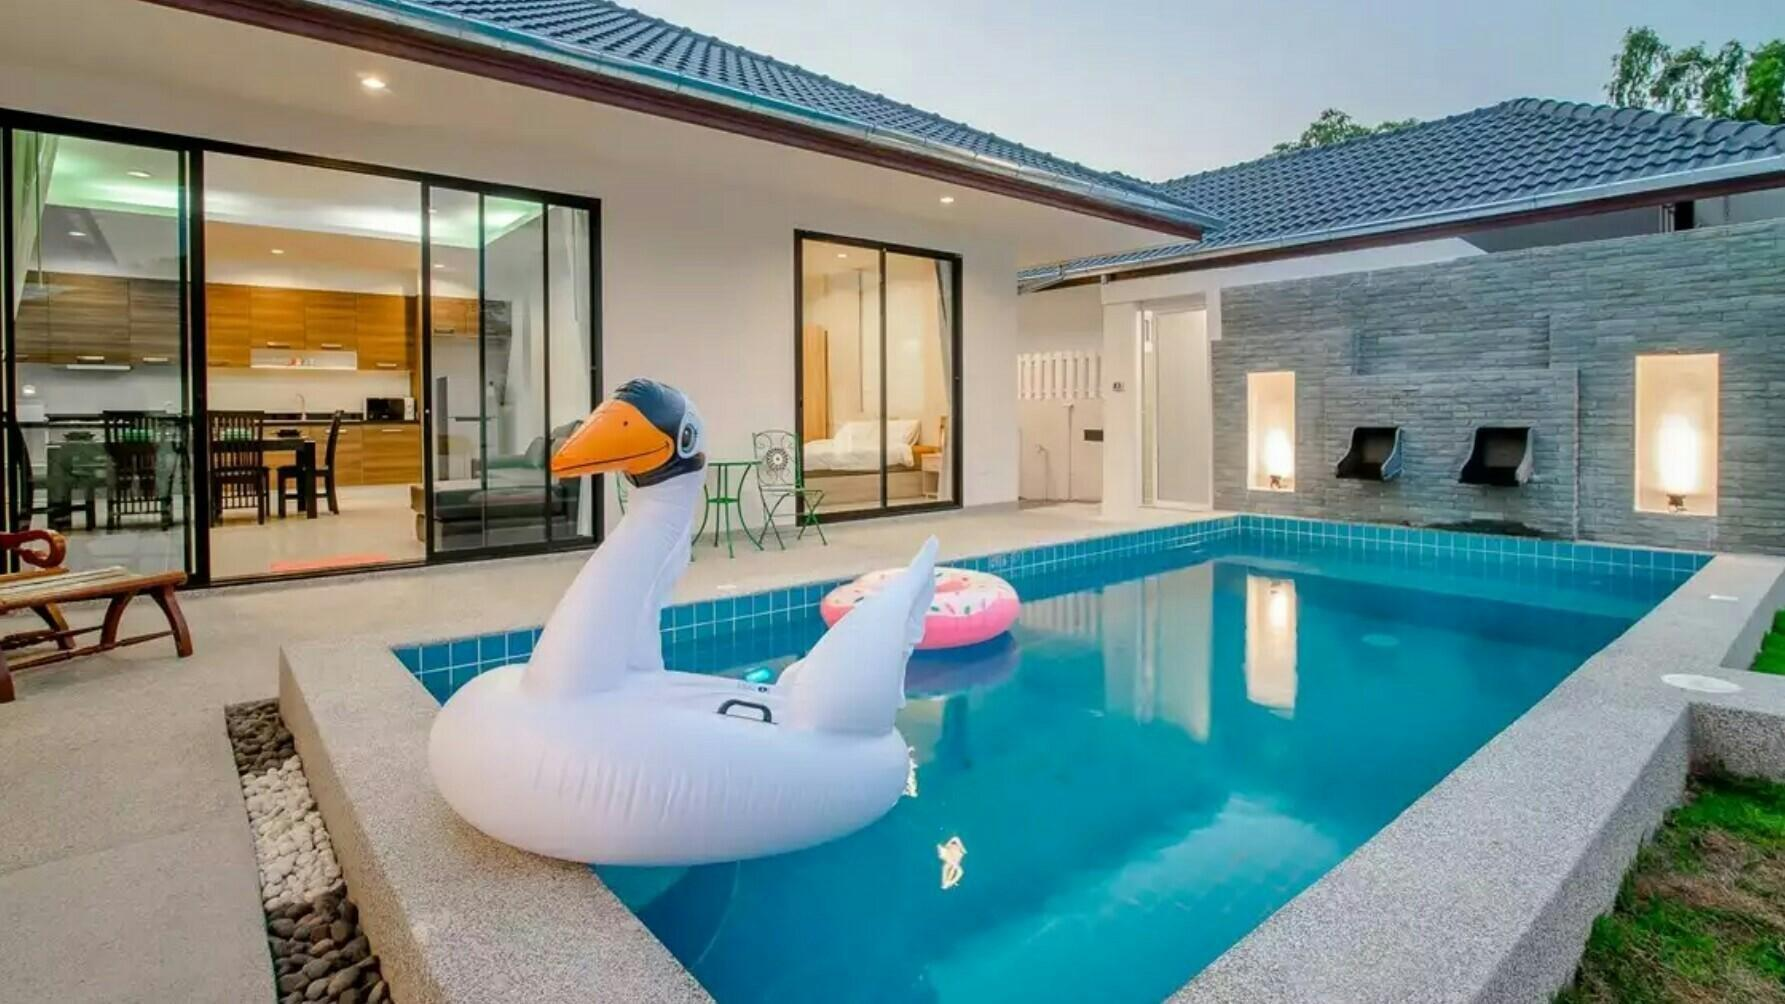 Modern Style PoolVilla | Center of HuaHin วิลลา 3 ห้องนอน 3 ห้องน้ำส่วนตัว ขนาด 200 ตร.ม. – กลางเมืองหัวหิน